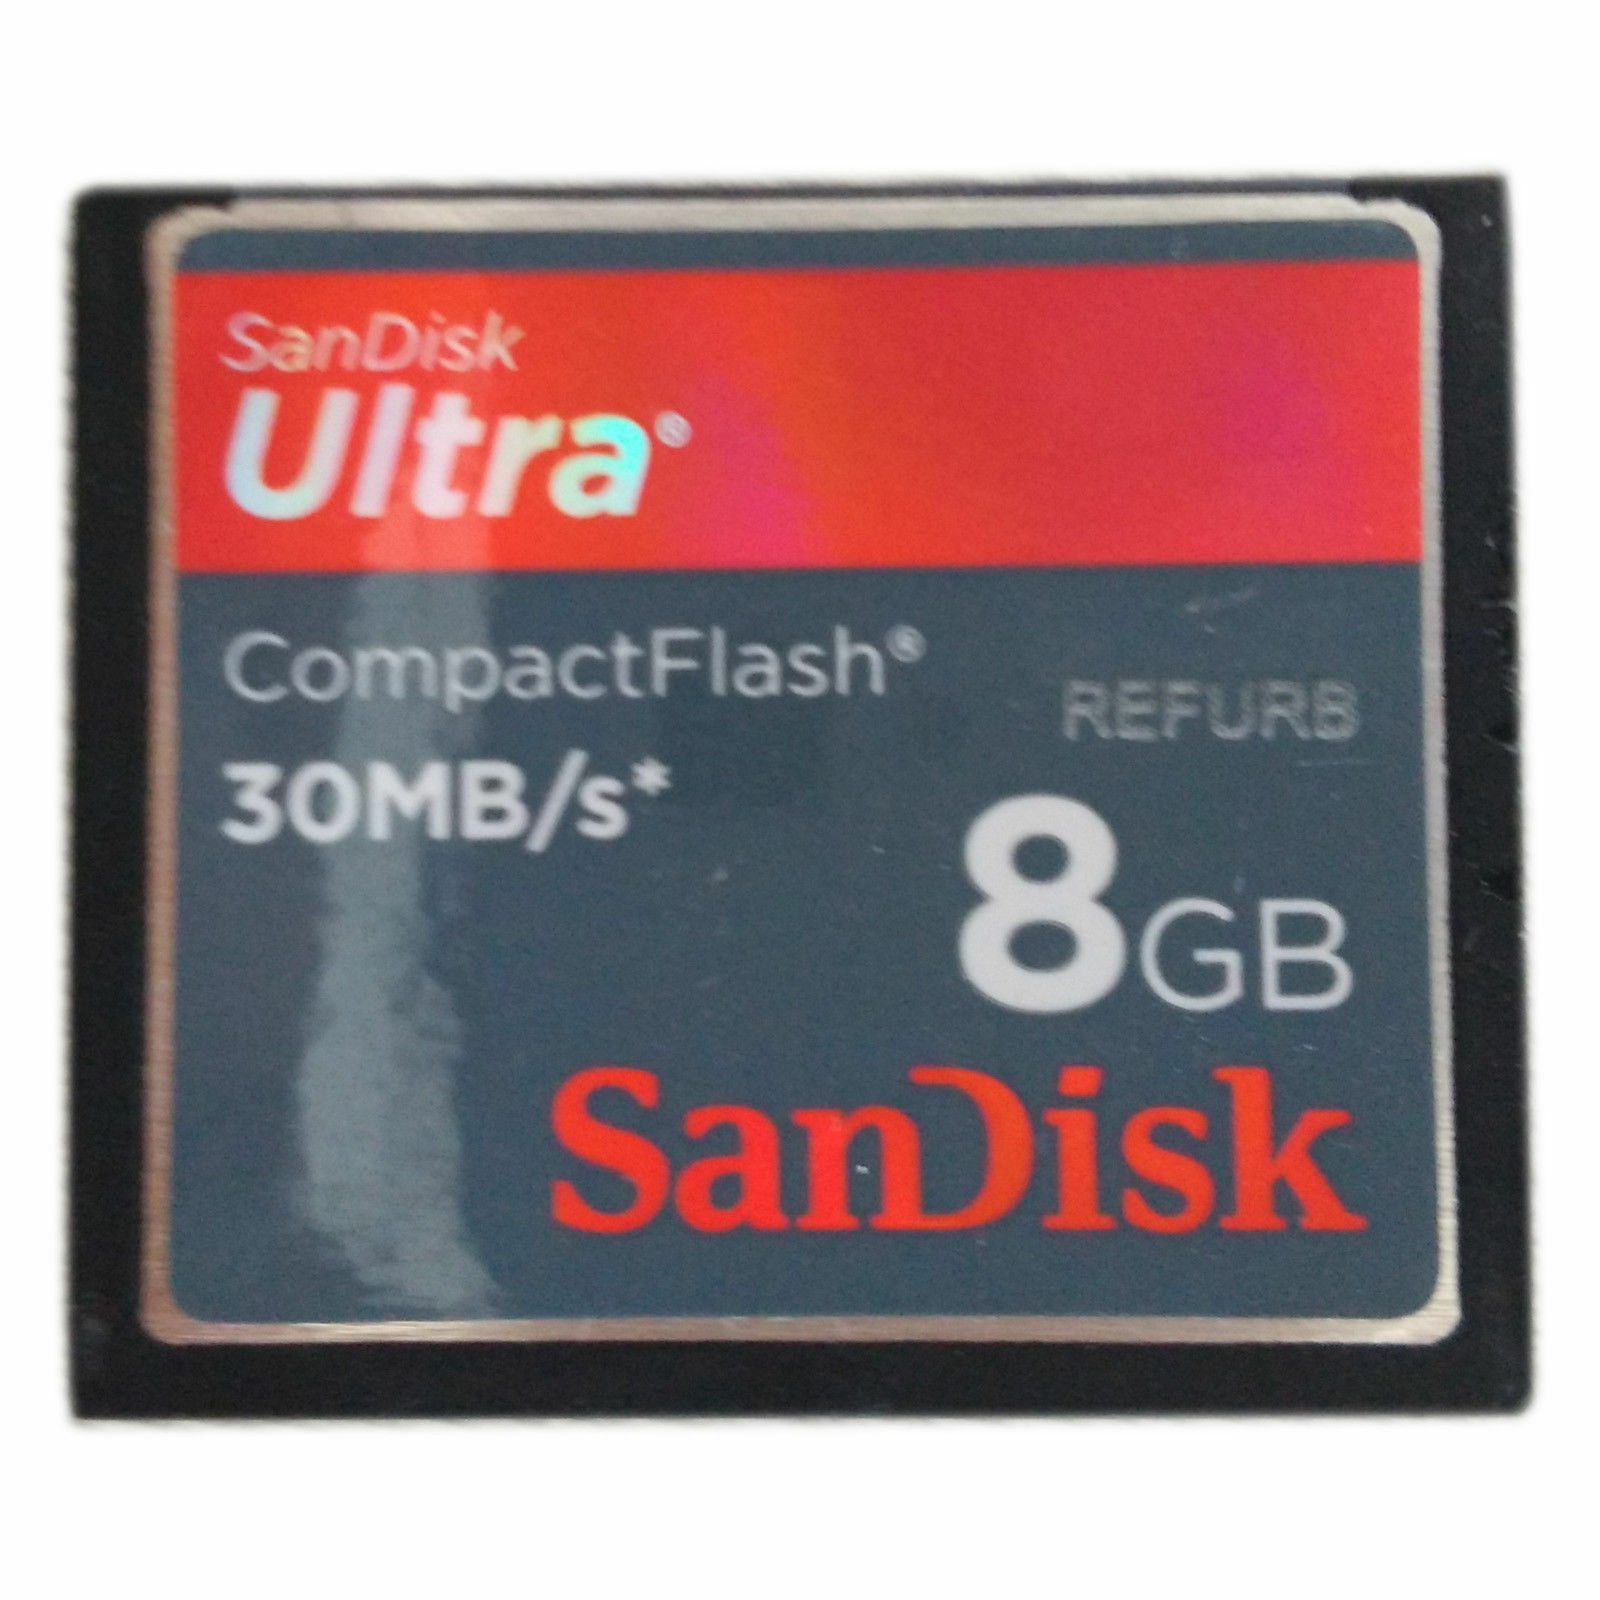 SanDisk 8GB Ultra 30MB//S Compactflash CF Memory Card 30MB//S SDCFH-008G Origiral